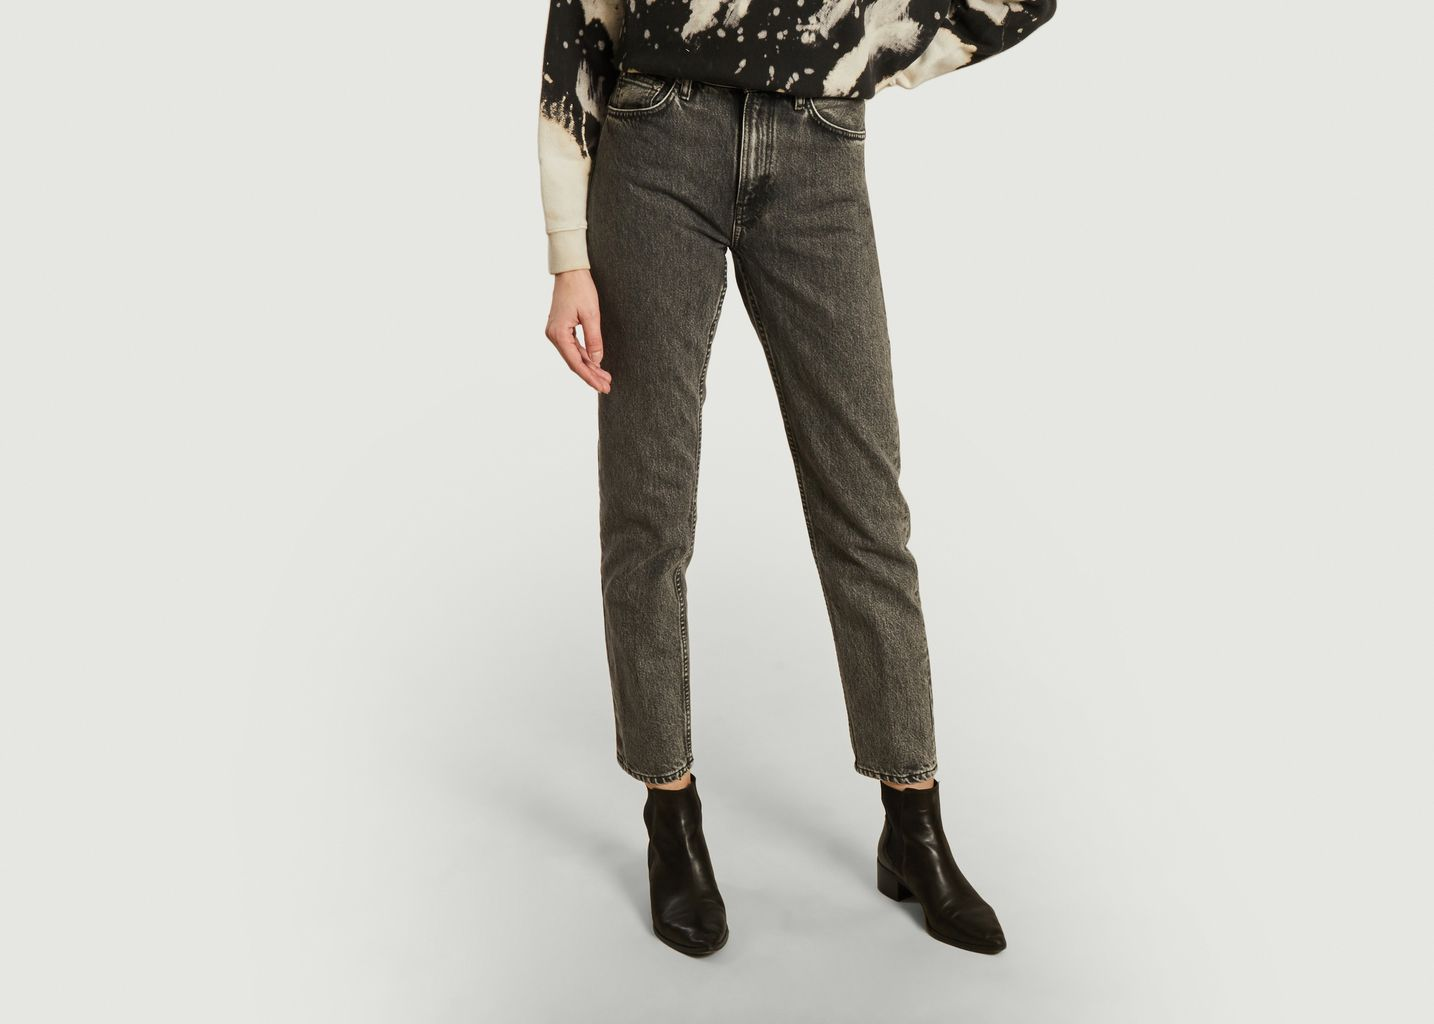 Jeans Mumfit Breezy Britt - Nudie Jeans